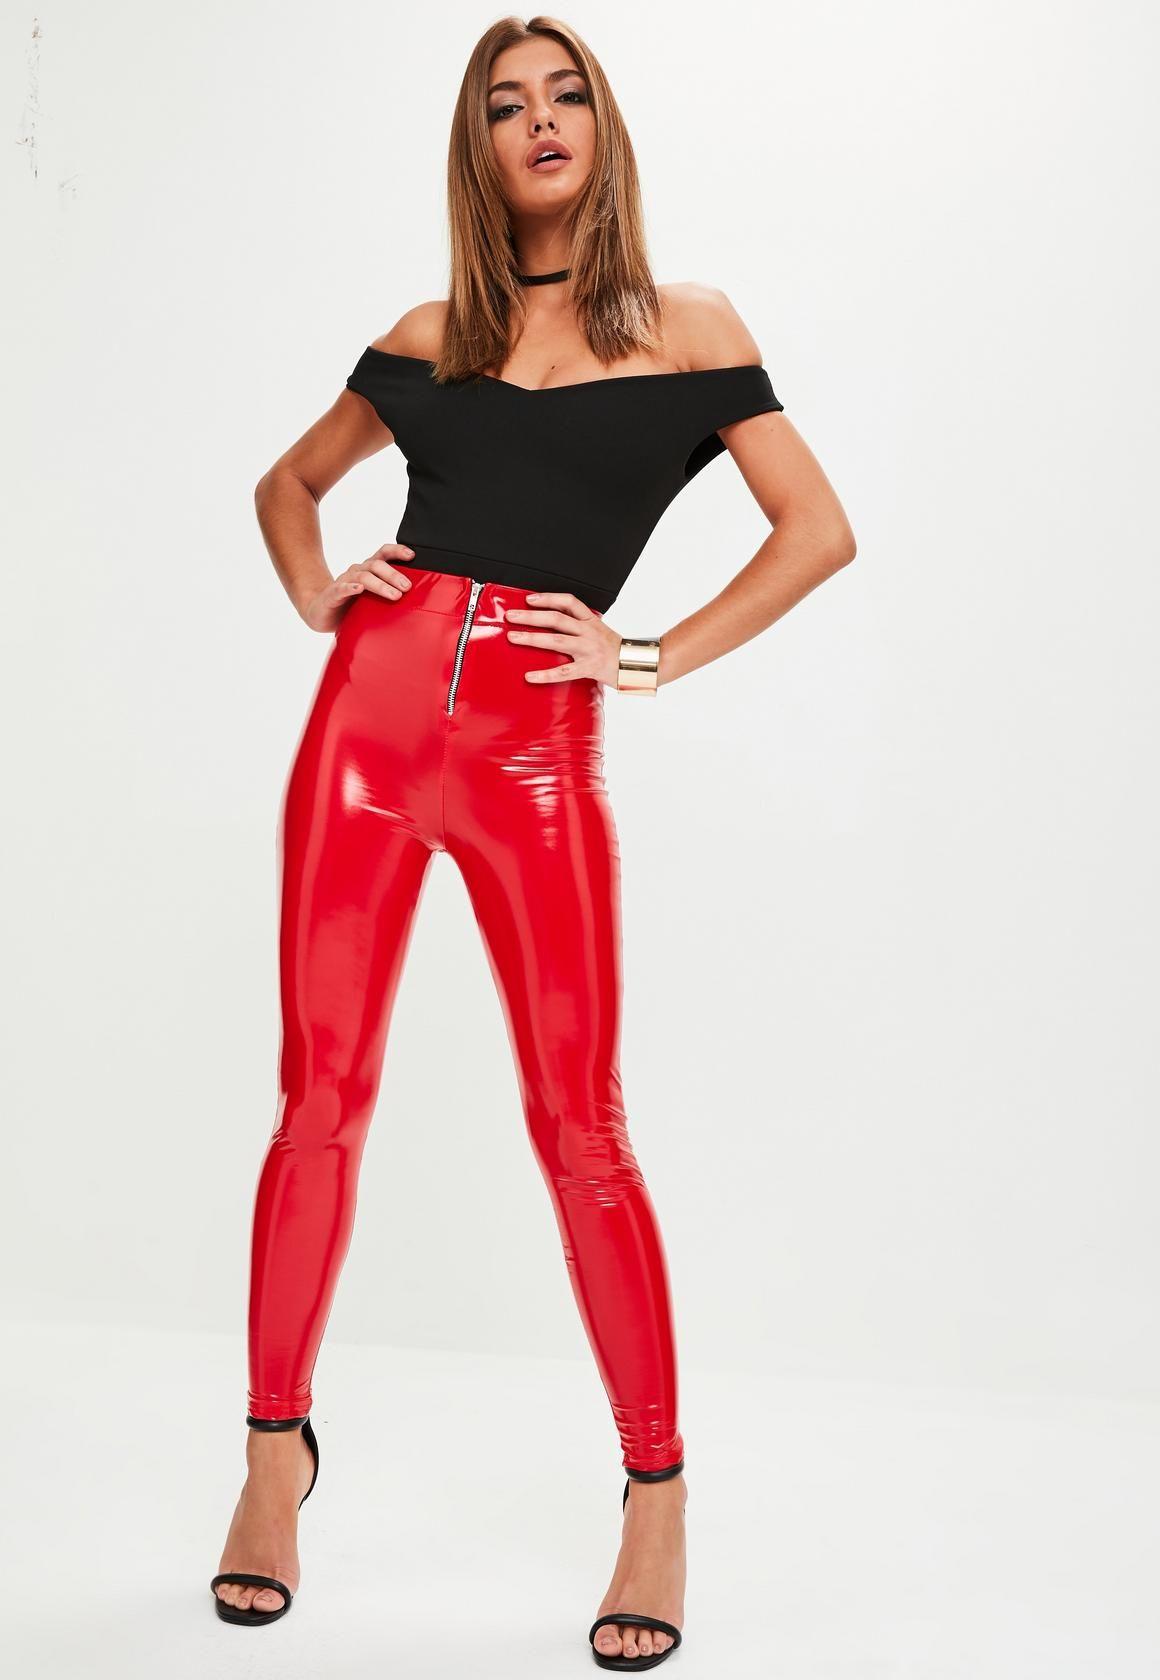 67076c3f7bfc1 Missguided - Red Vinyl Leggings | Vinyl | Vinyl leggings, Pants ...